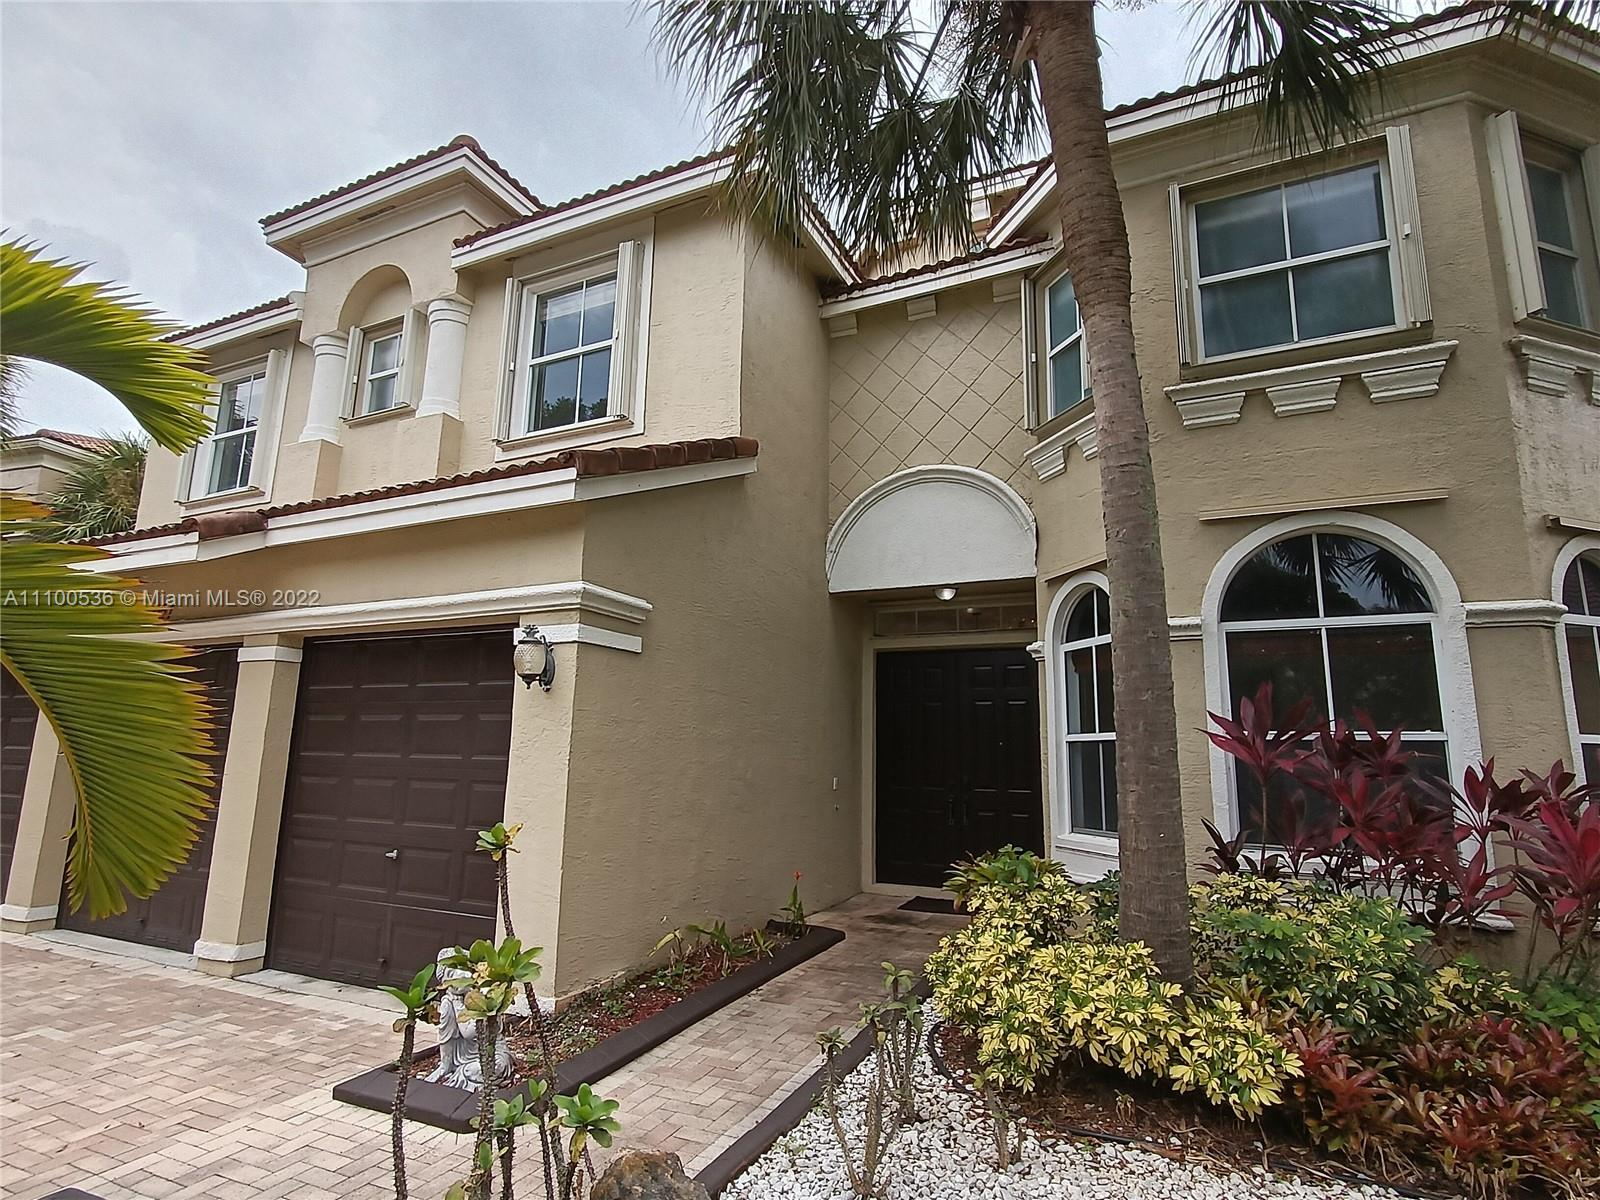 5051 158th Ave, Miramar, Florida 33027